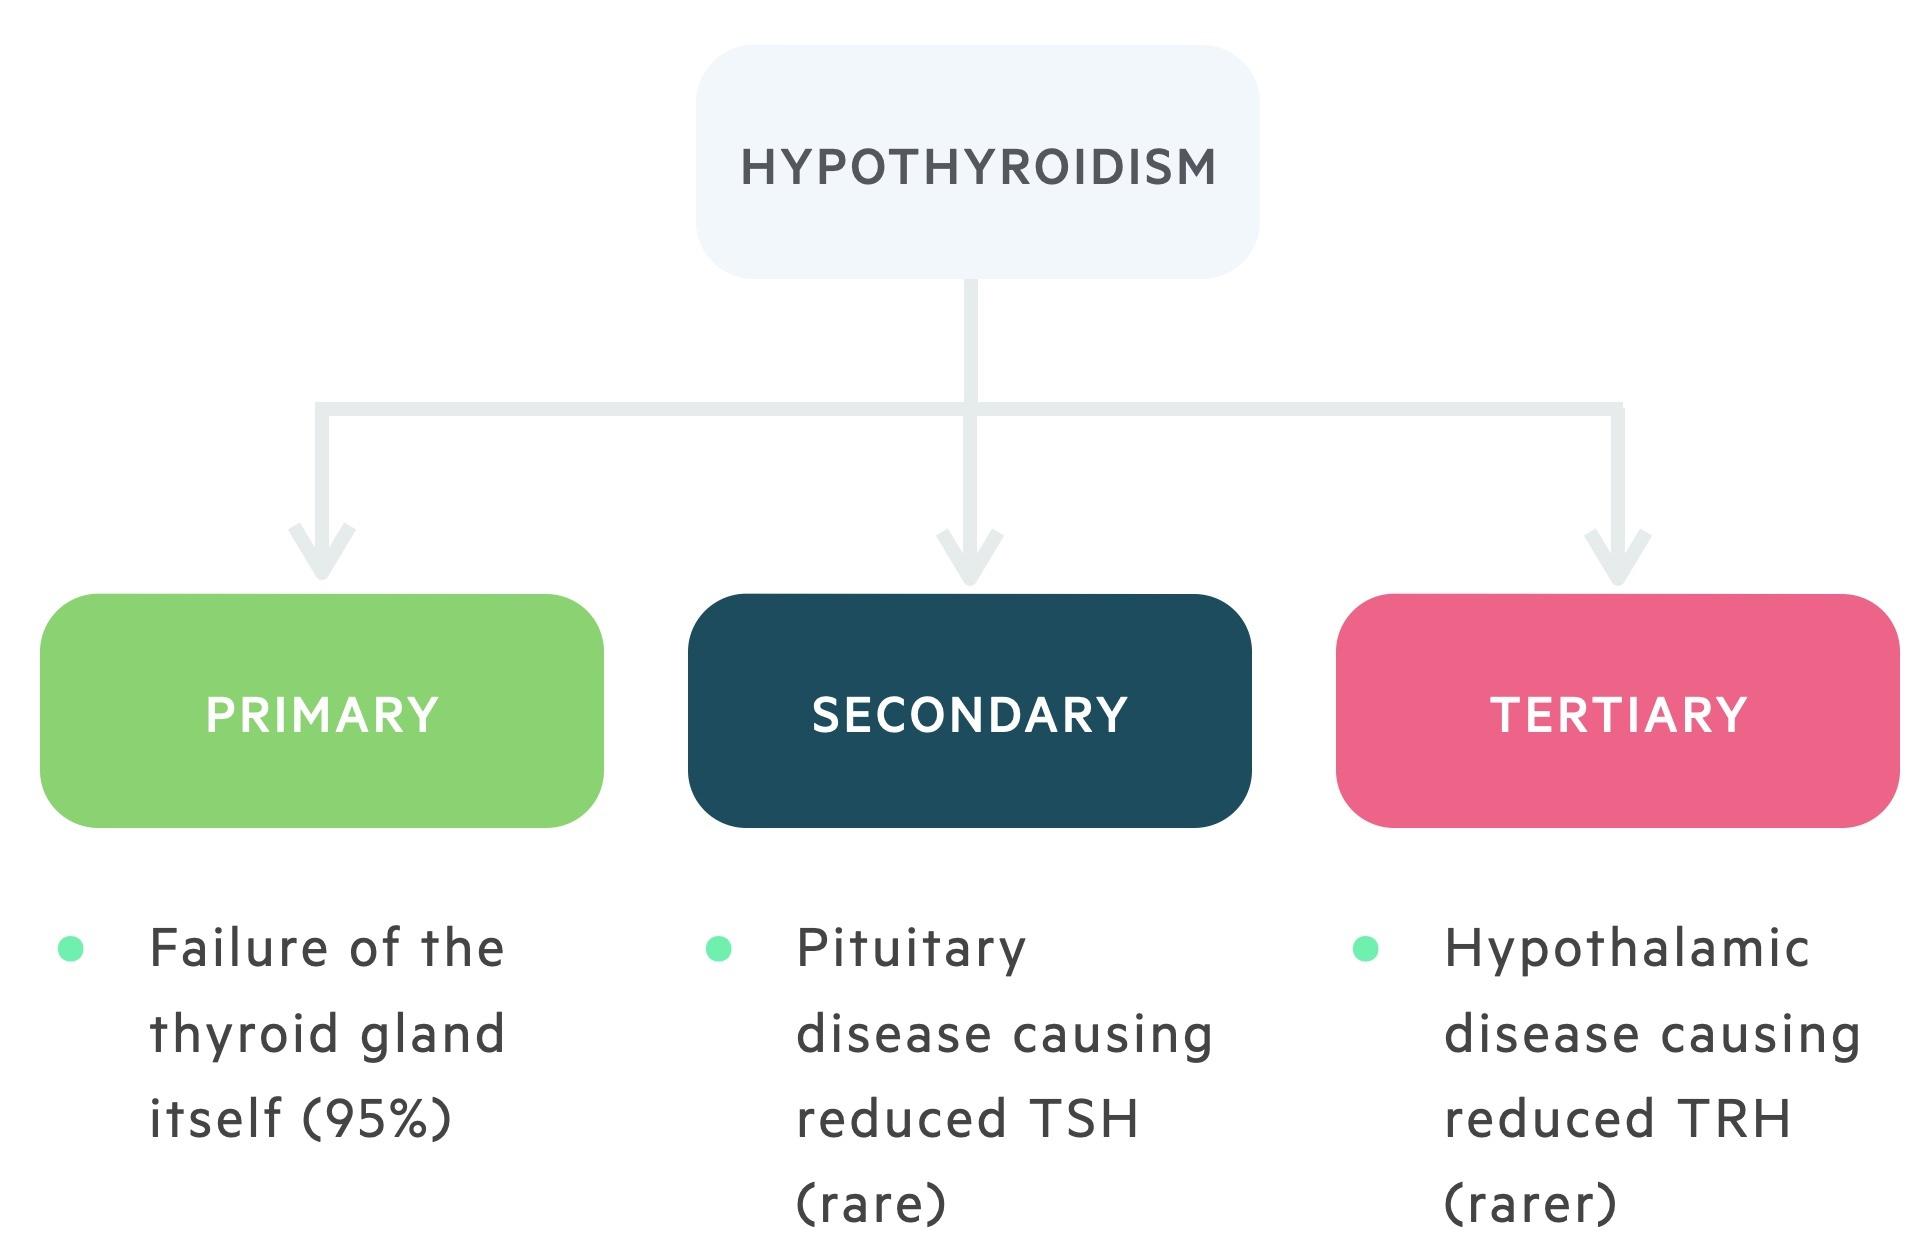 Classification of hypothyroidism